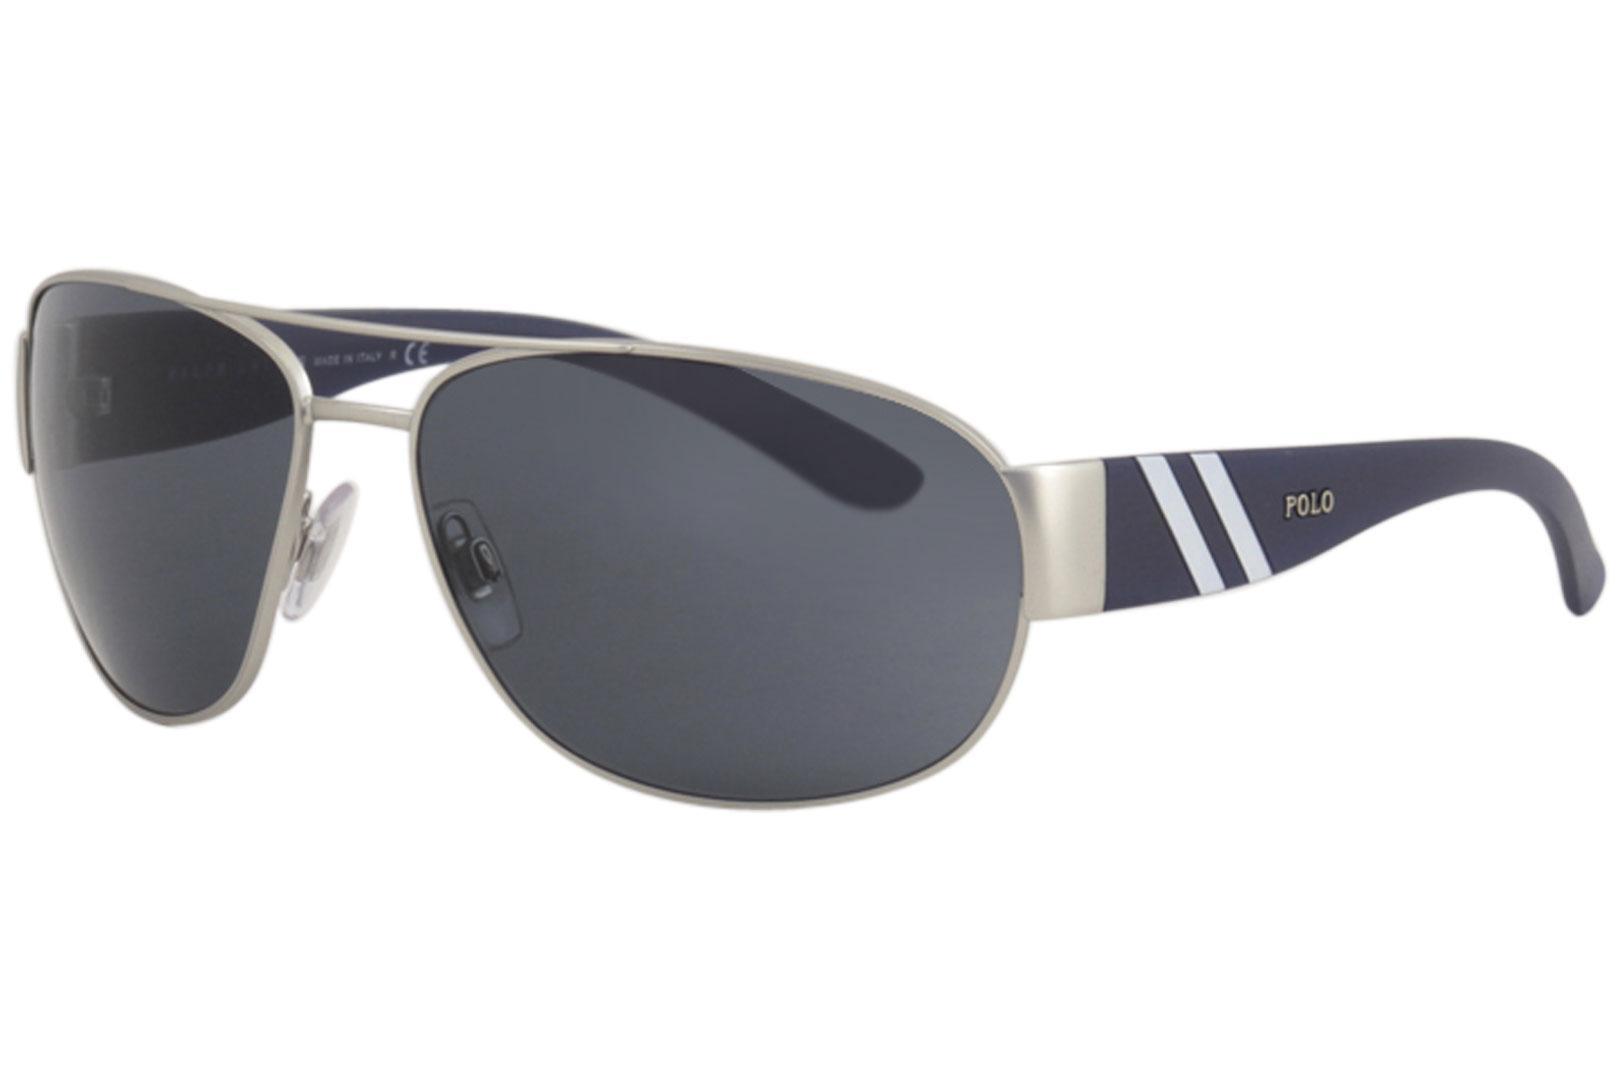 0b3e73ffe0 Polo Ralph Lauren Men s PH3052 PH 3052 Fashion Pilot Sunglasses by Polo  Ralph Lauren